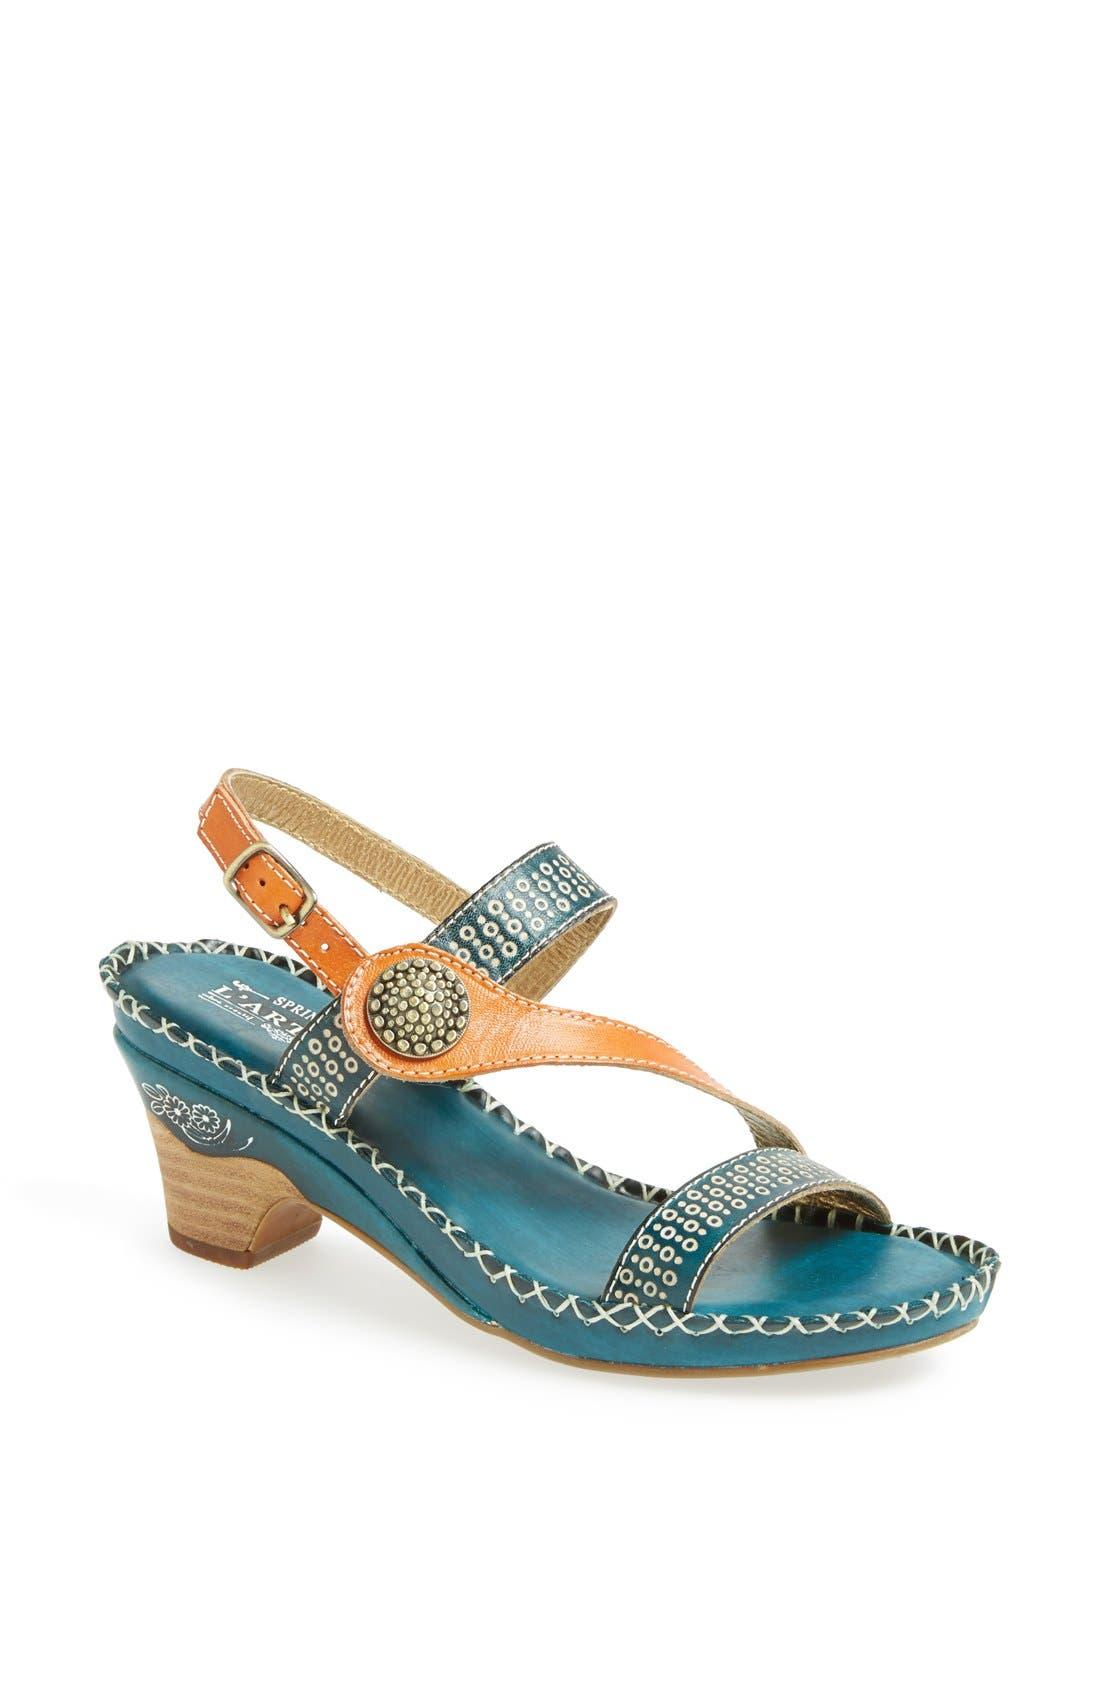 Alternate Image 1 Selected - Spring Step 'Dreamer' Sandal